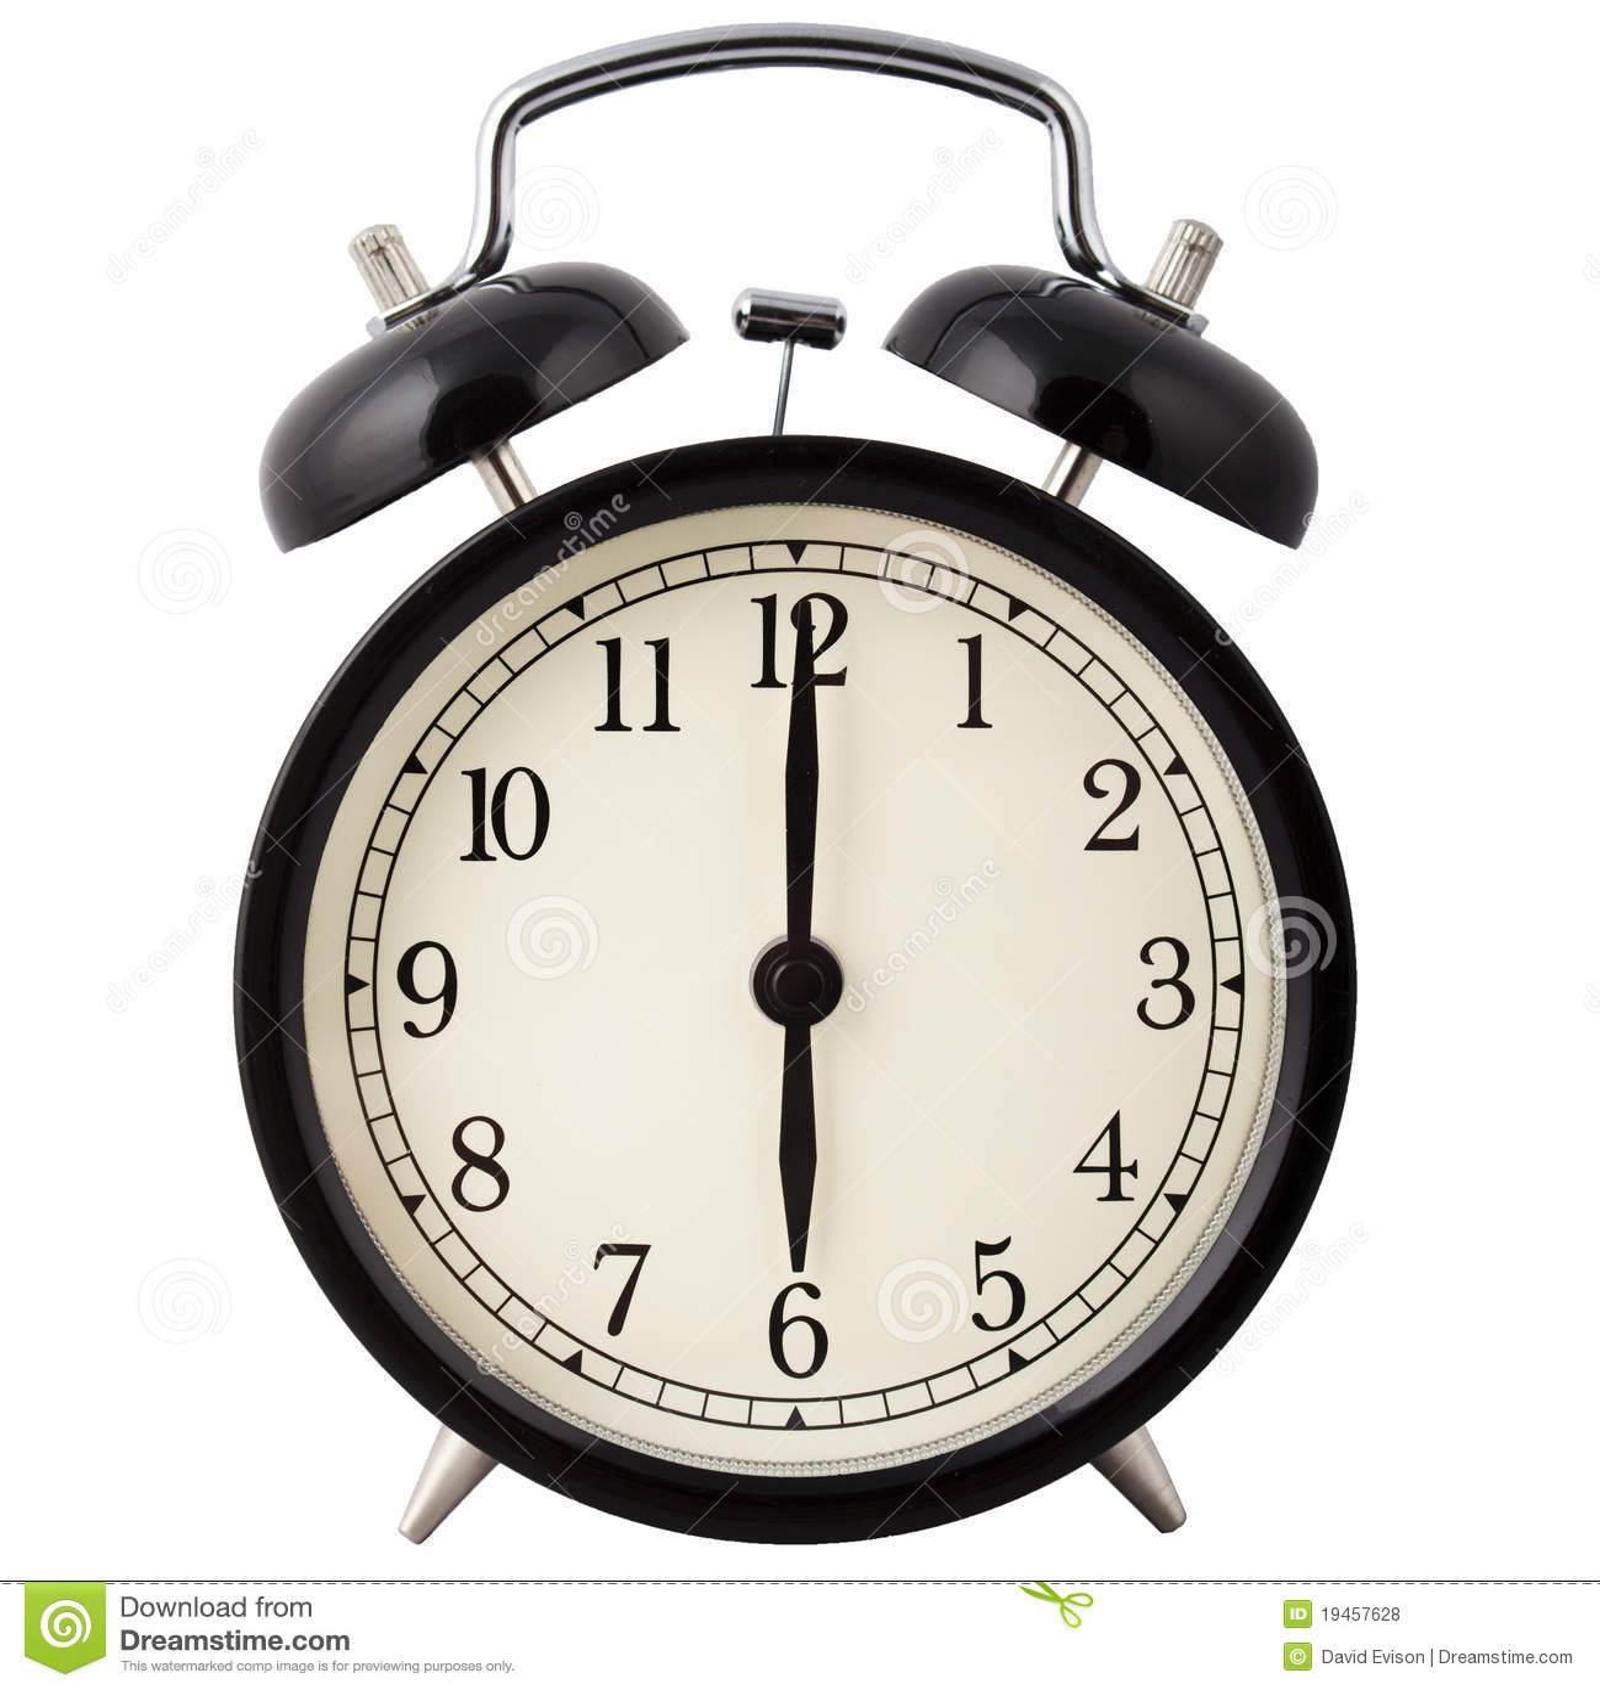 alarm clock showing six o 39 clock stock photo image of awake countdown 19457628. Black Bedroom Furniture Sets. Home Design Ideas